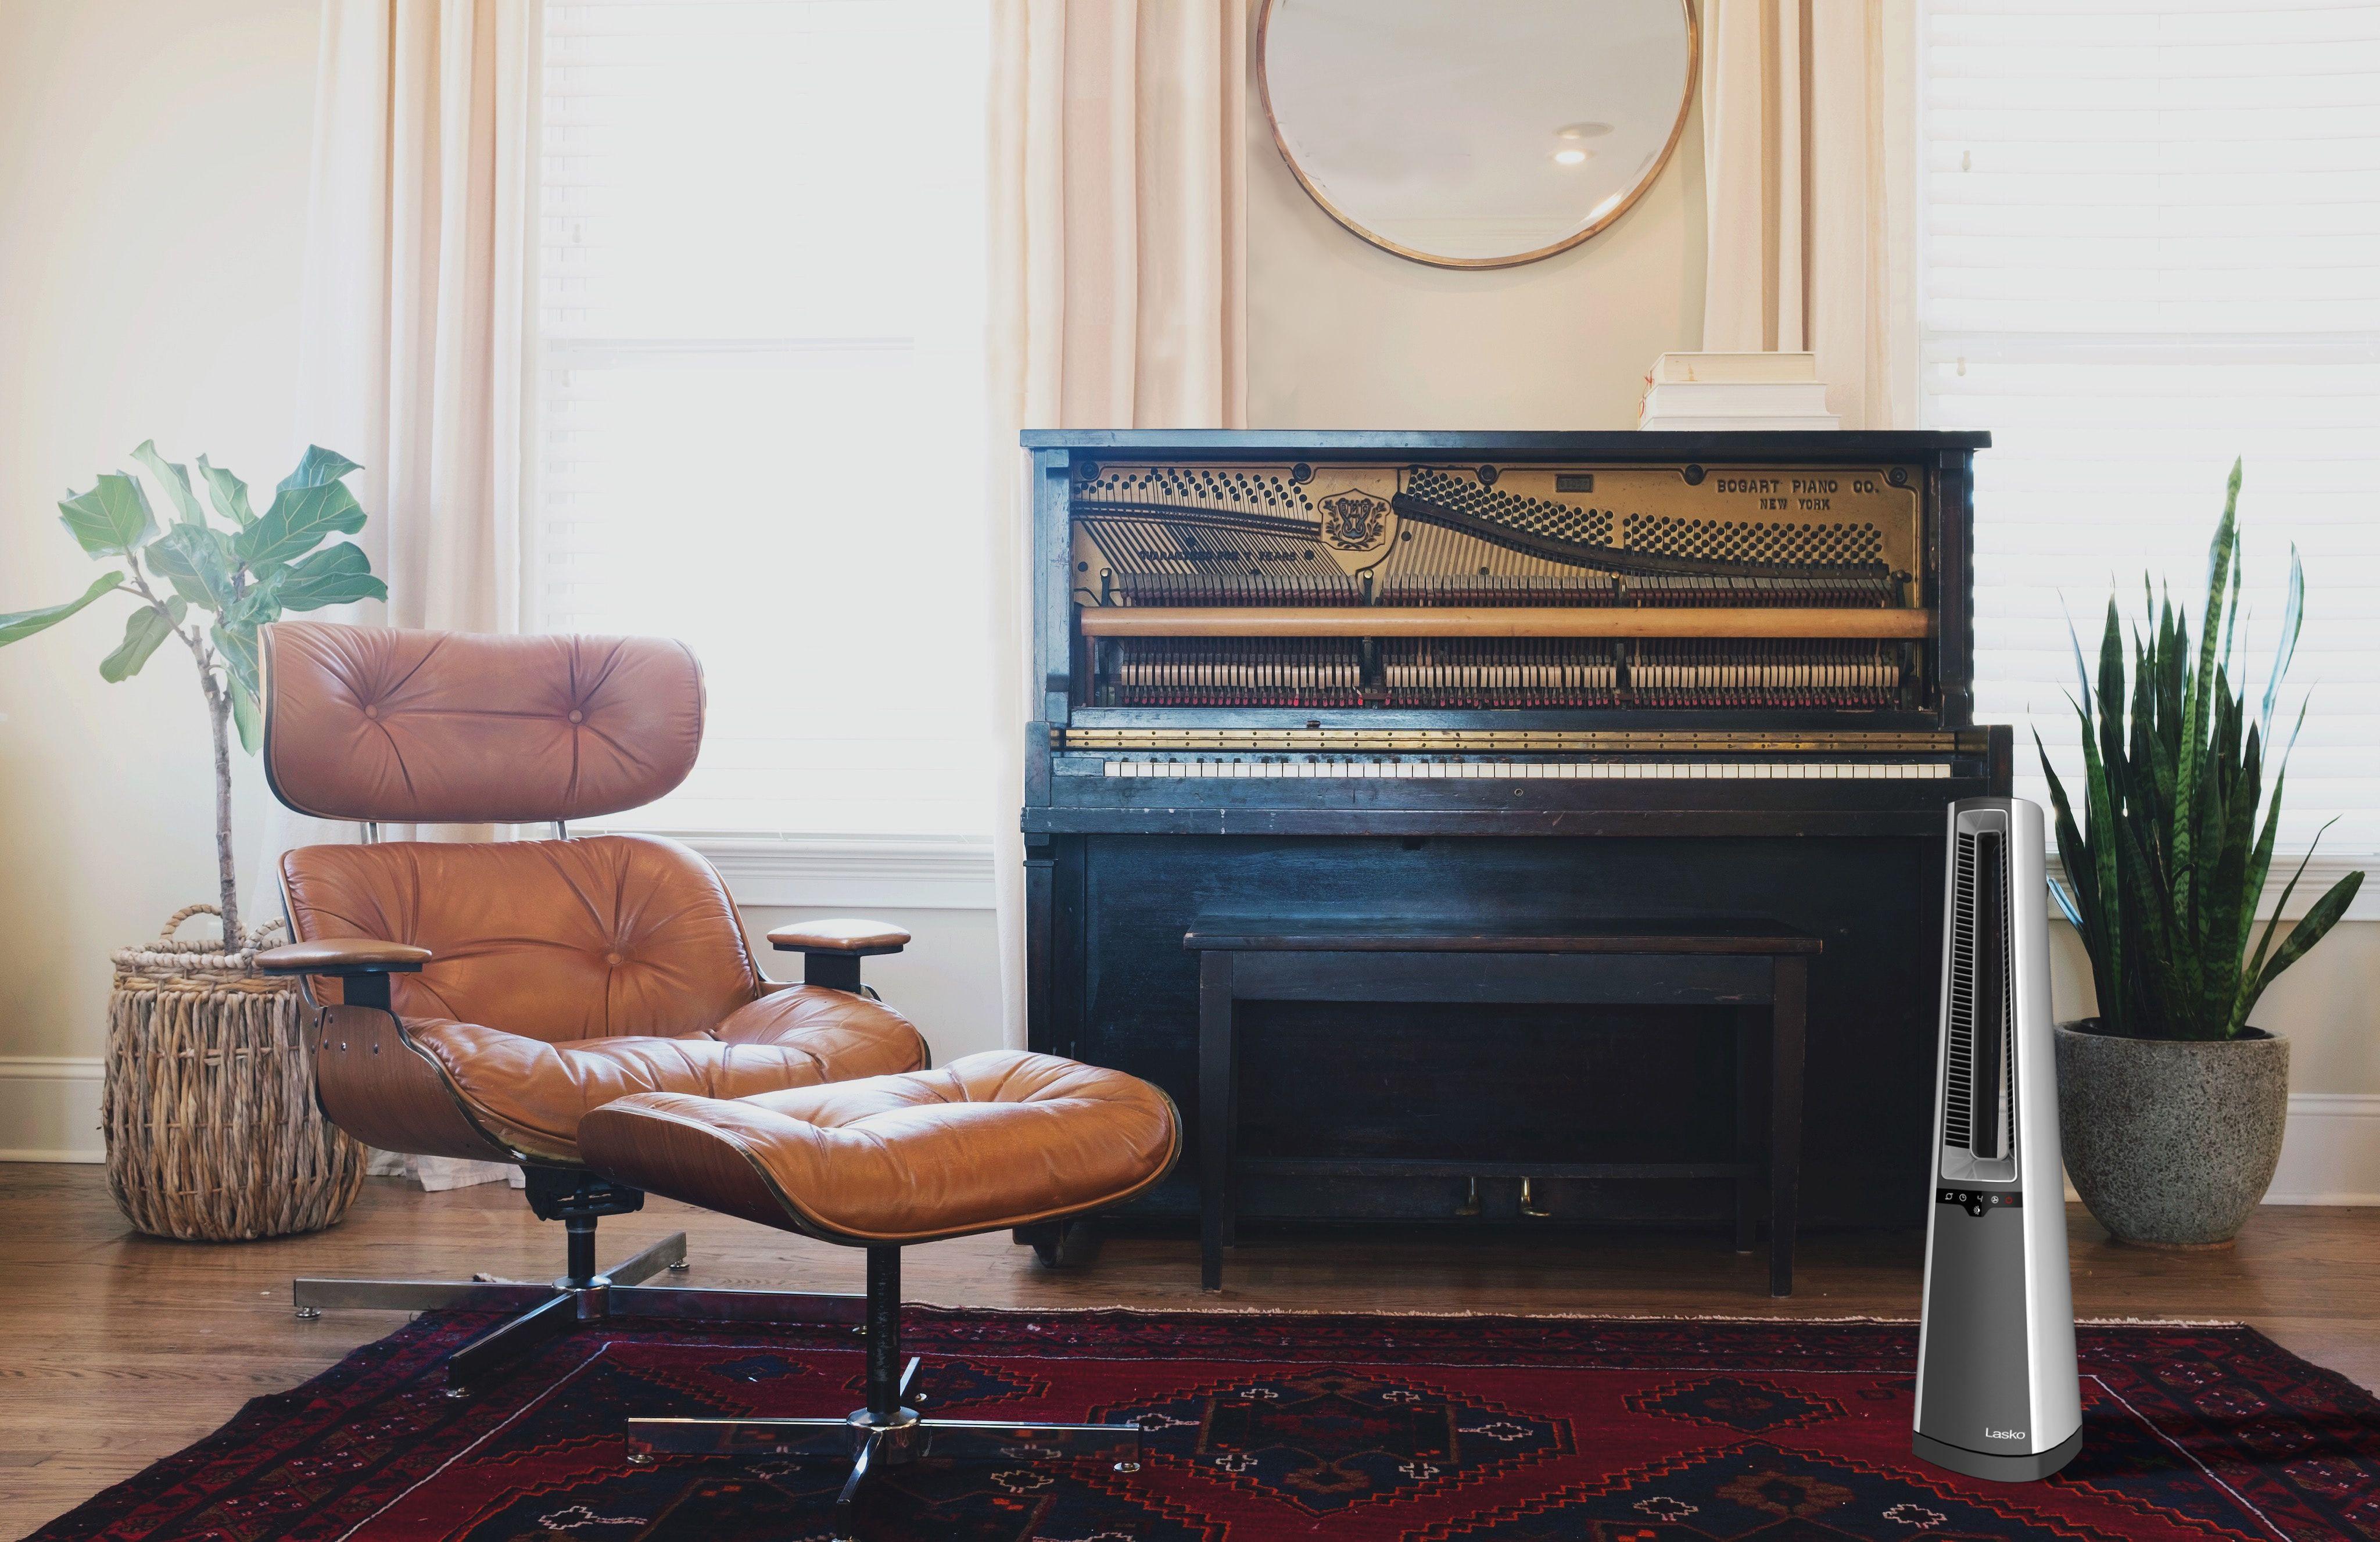 Bladeless Ceramic Heater With Remote Control Lasko In 2020 Classic Furniture Interior Interior Design